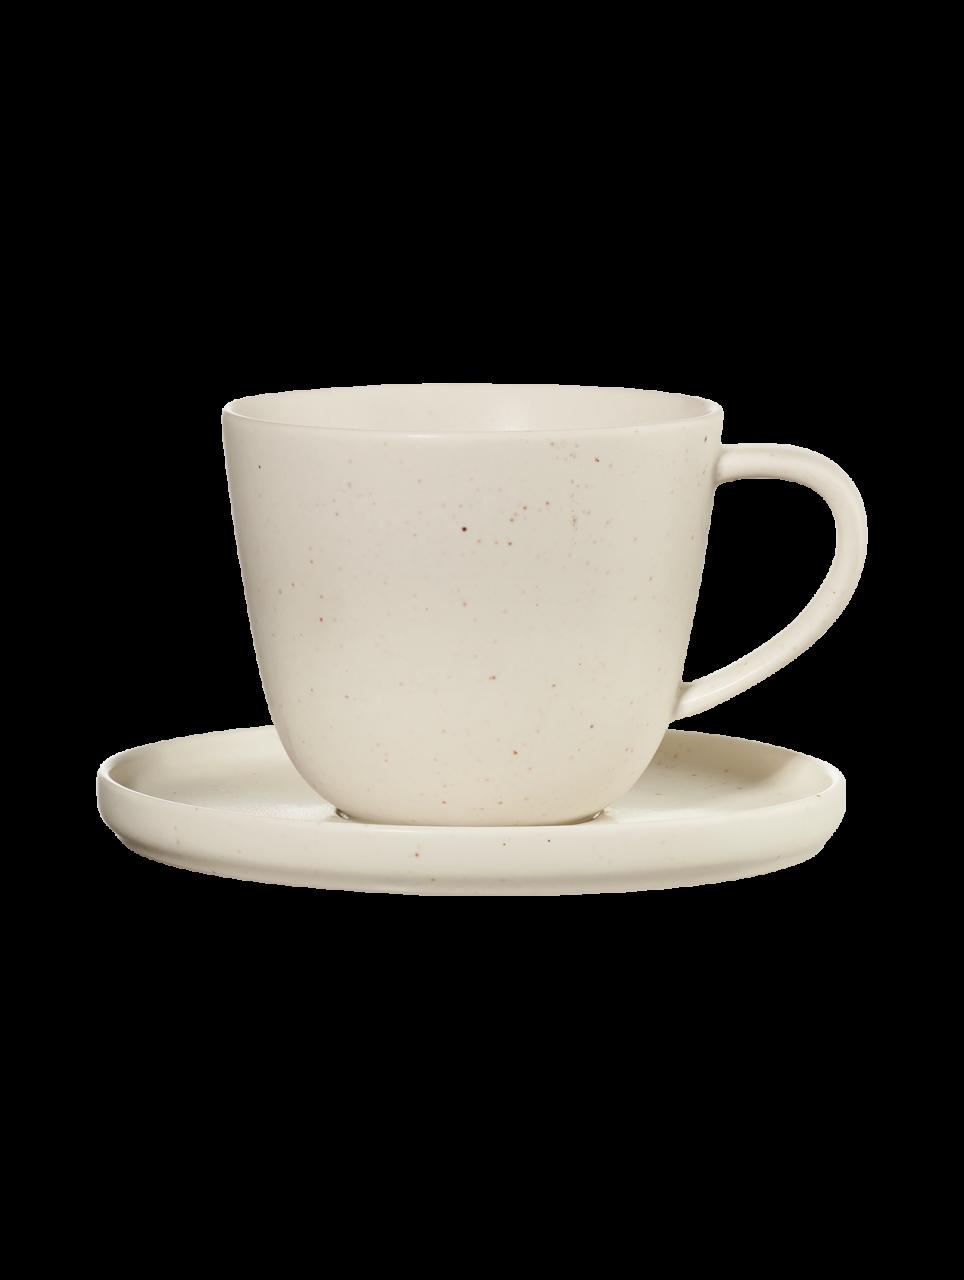 Kaffeetasse mit Unterer, sencha